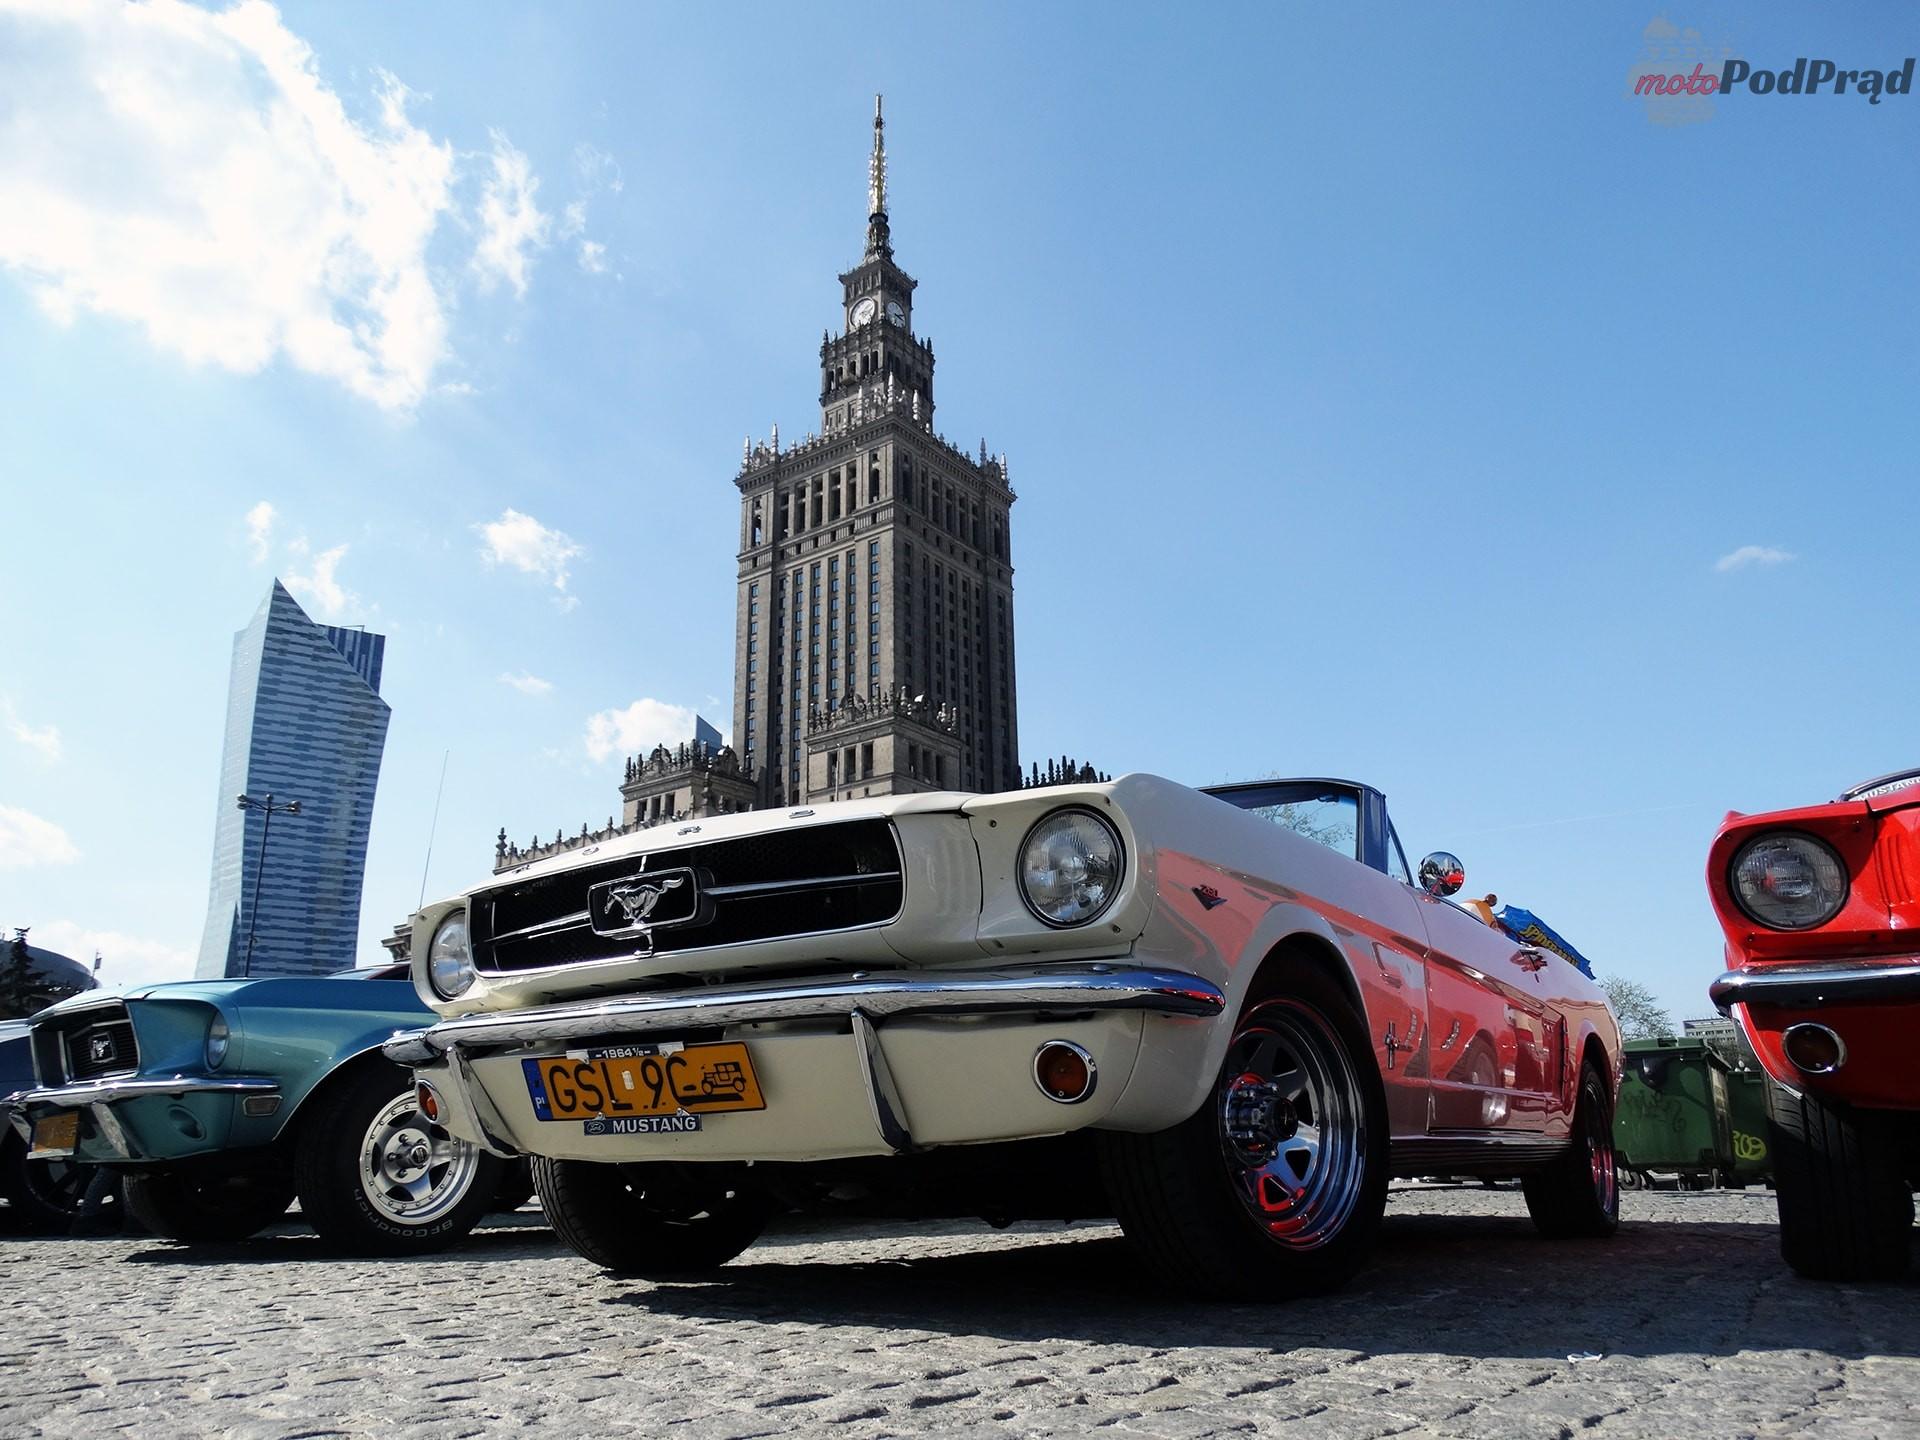 X zlot Ford Mustang Polska 2 X Zlot Mustang Klub Polska czyli stare i najnowsze Mustangi